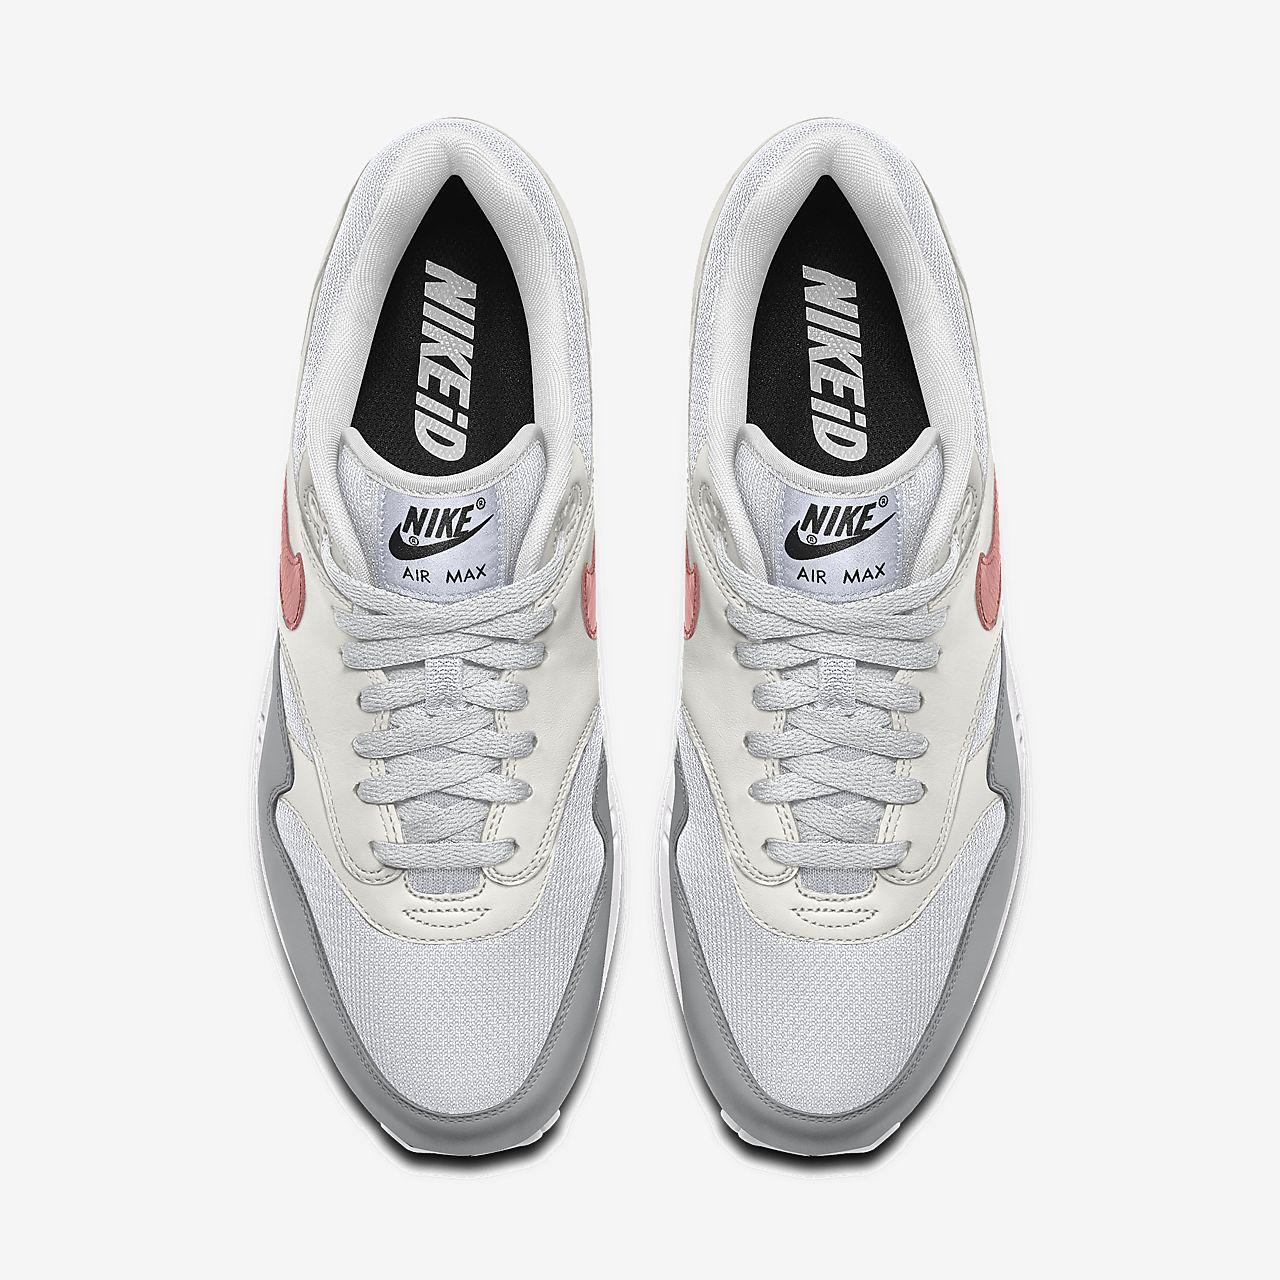 Nike Air Max 1 By You personalisierbarer Damenschuh